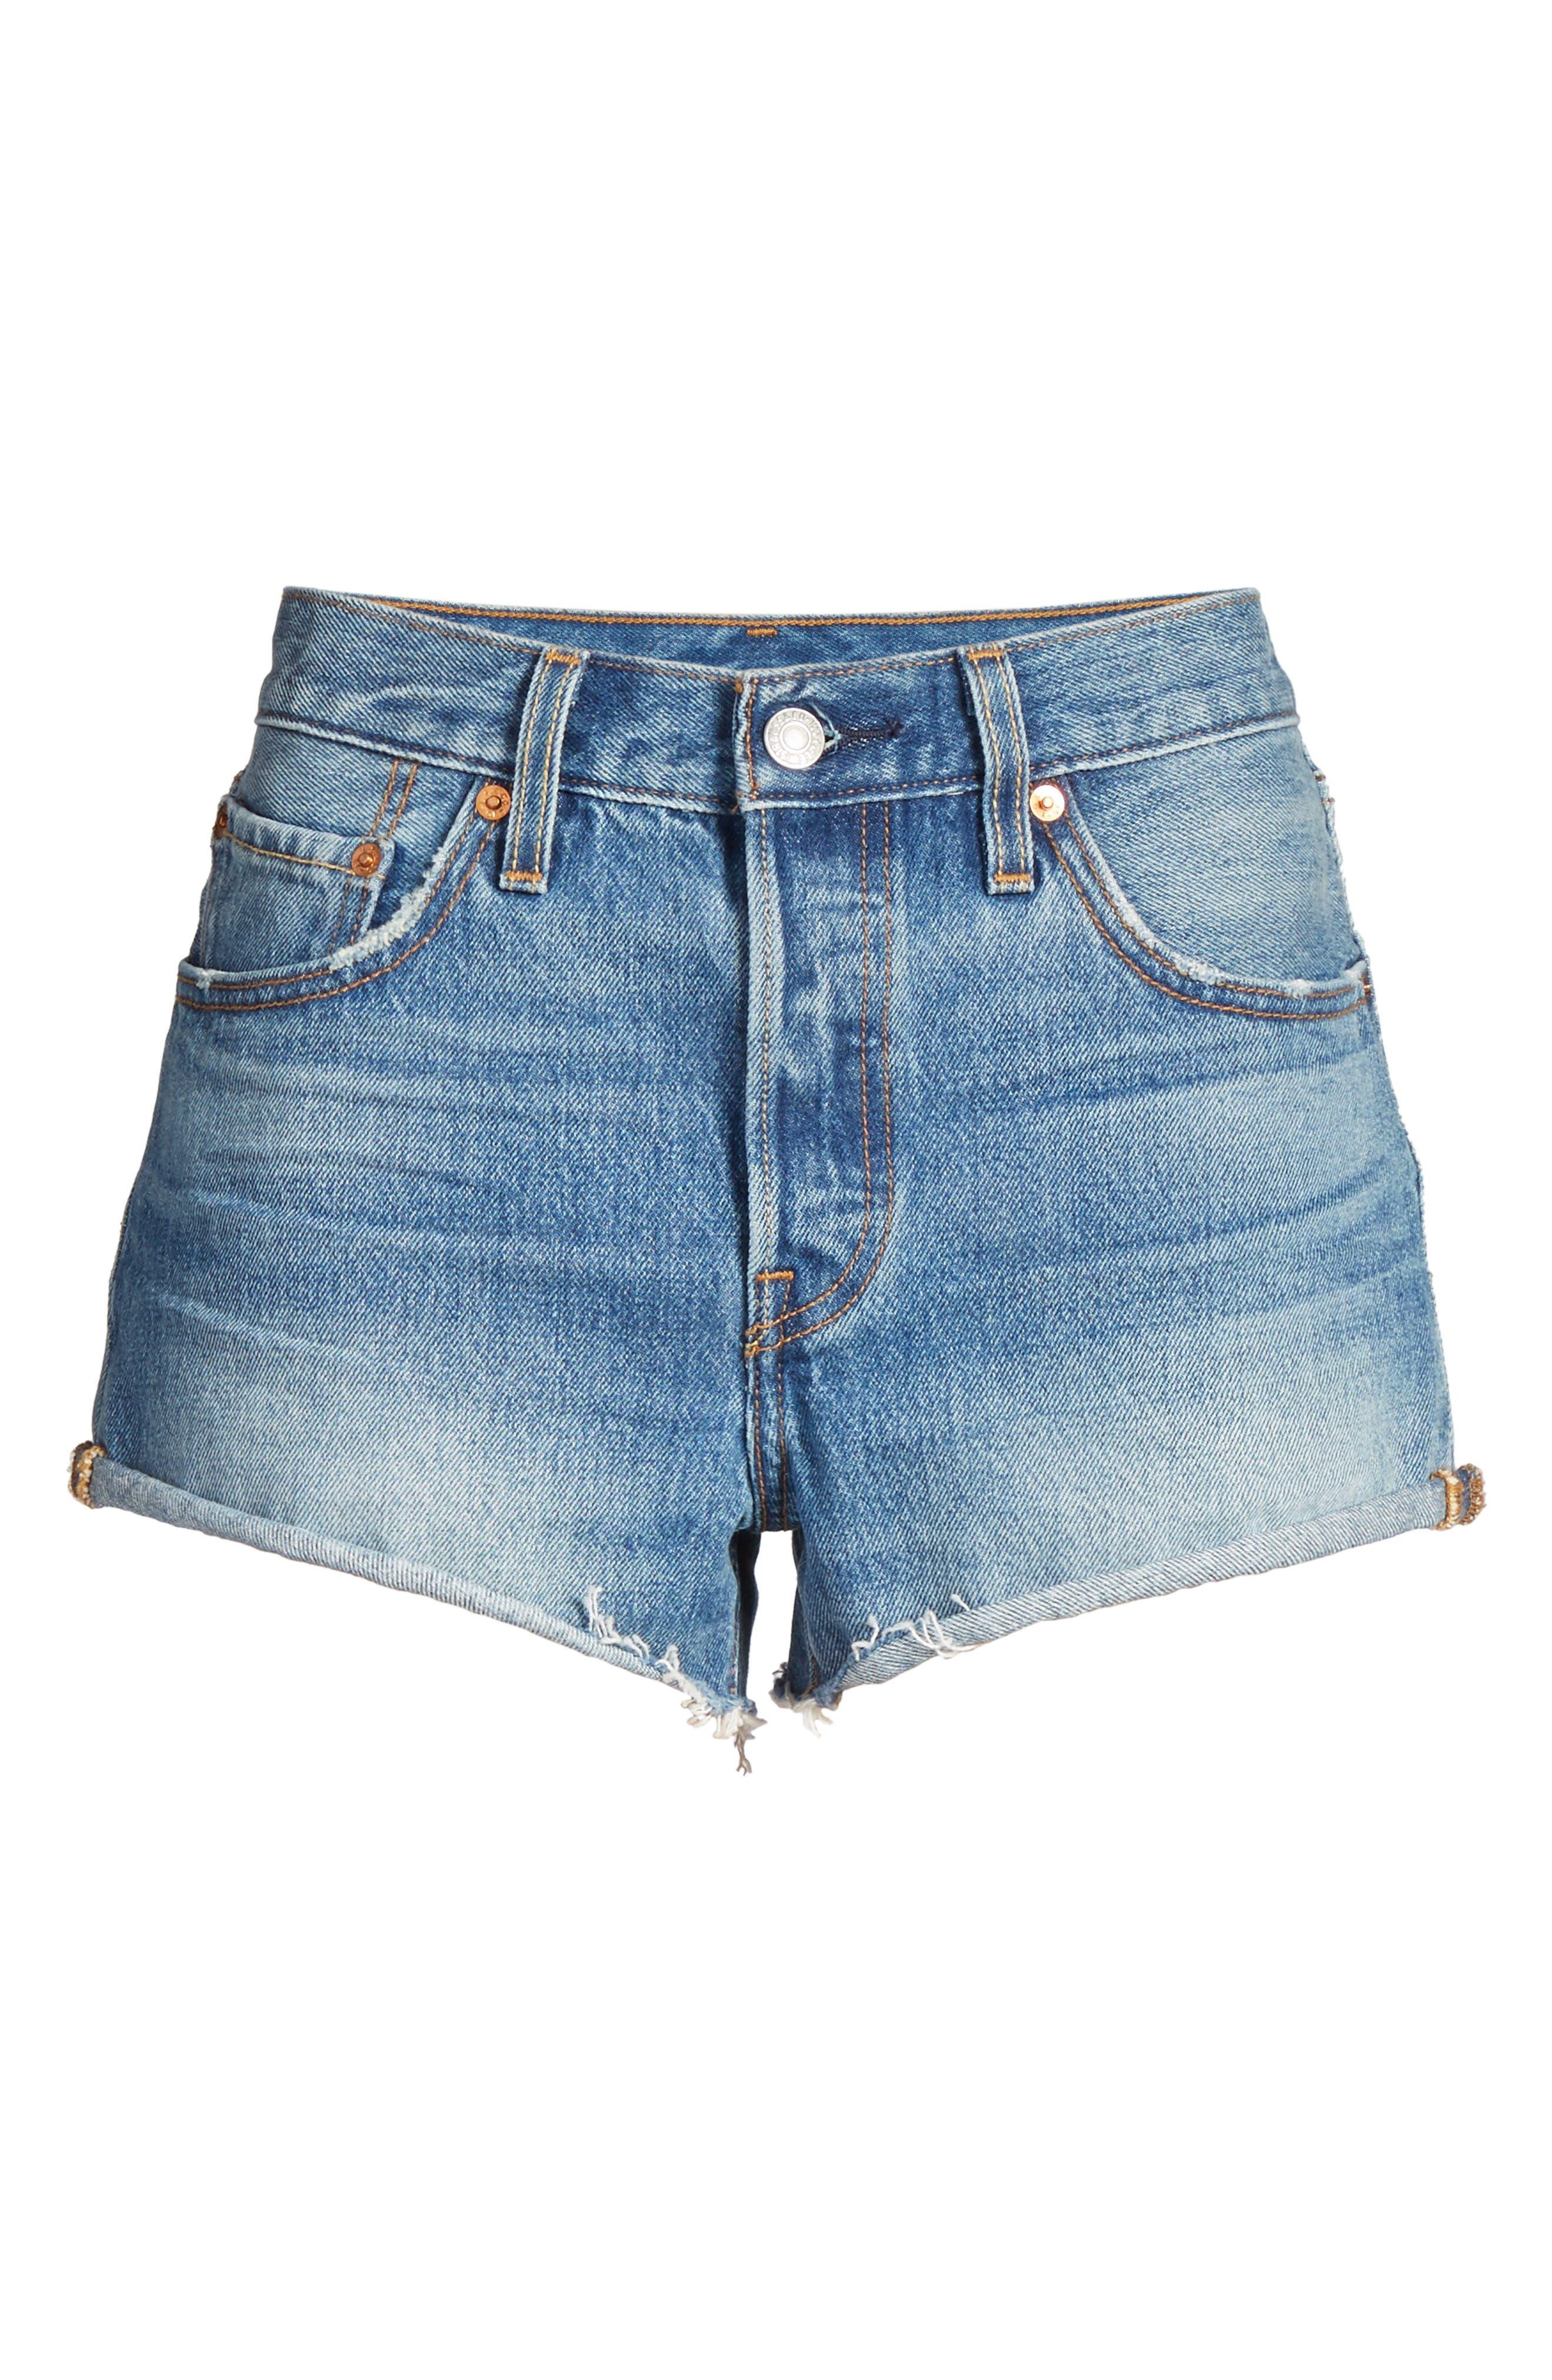 Cutoff Denim Shorts,                             Alternate thumbnail 6, color,                             400